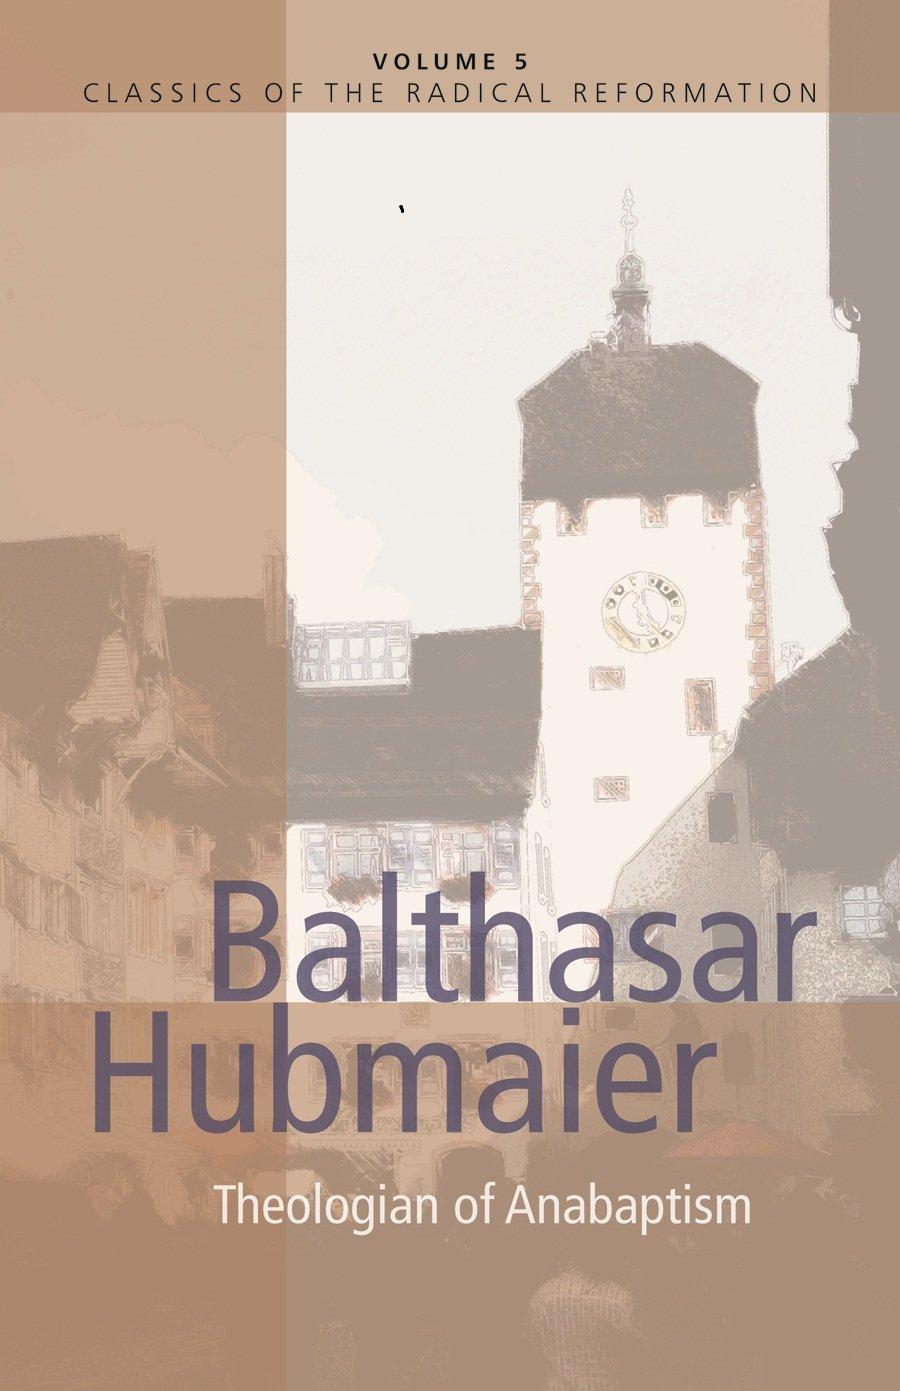 Balthasar Hubmaier: Theologian of Anabaptism (Classics of the Radical  Reformation): H. Wayne Pipkin: 9780836131031: Amazon.com: Books